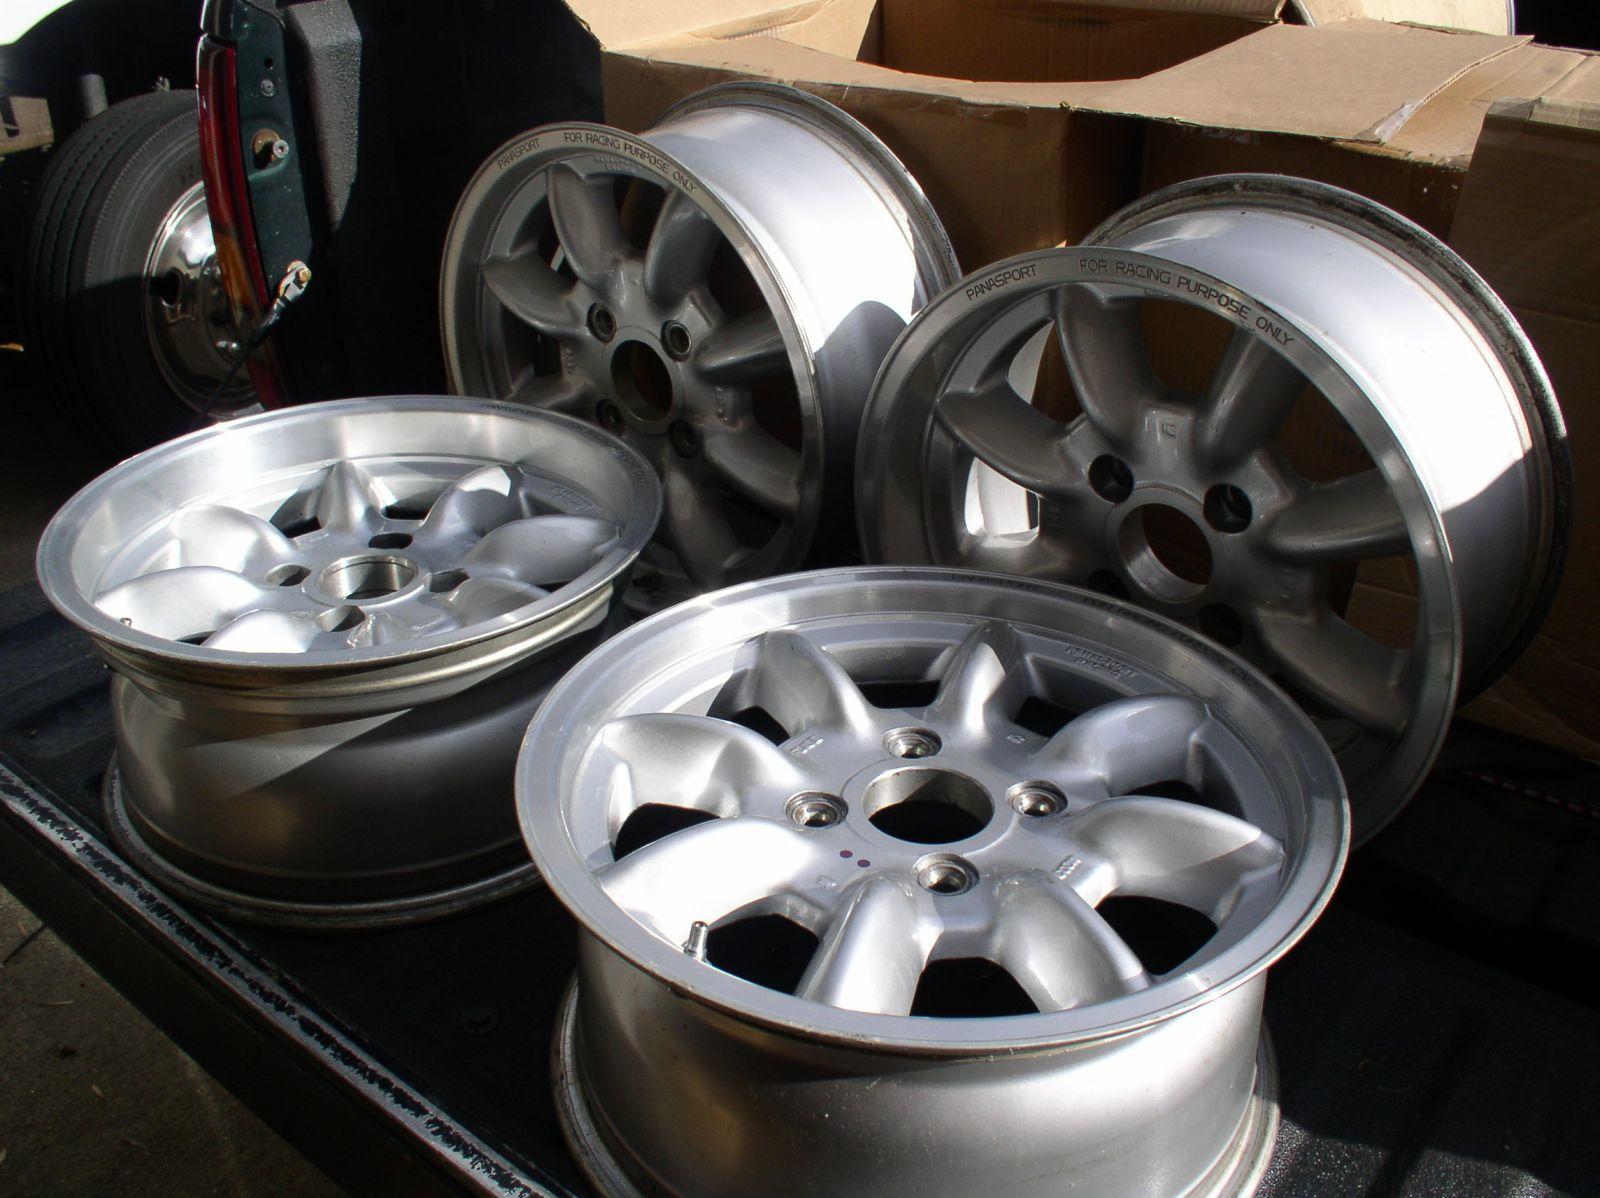 Panasport Wheels 15x7 +0 & +38 offsets